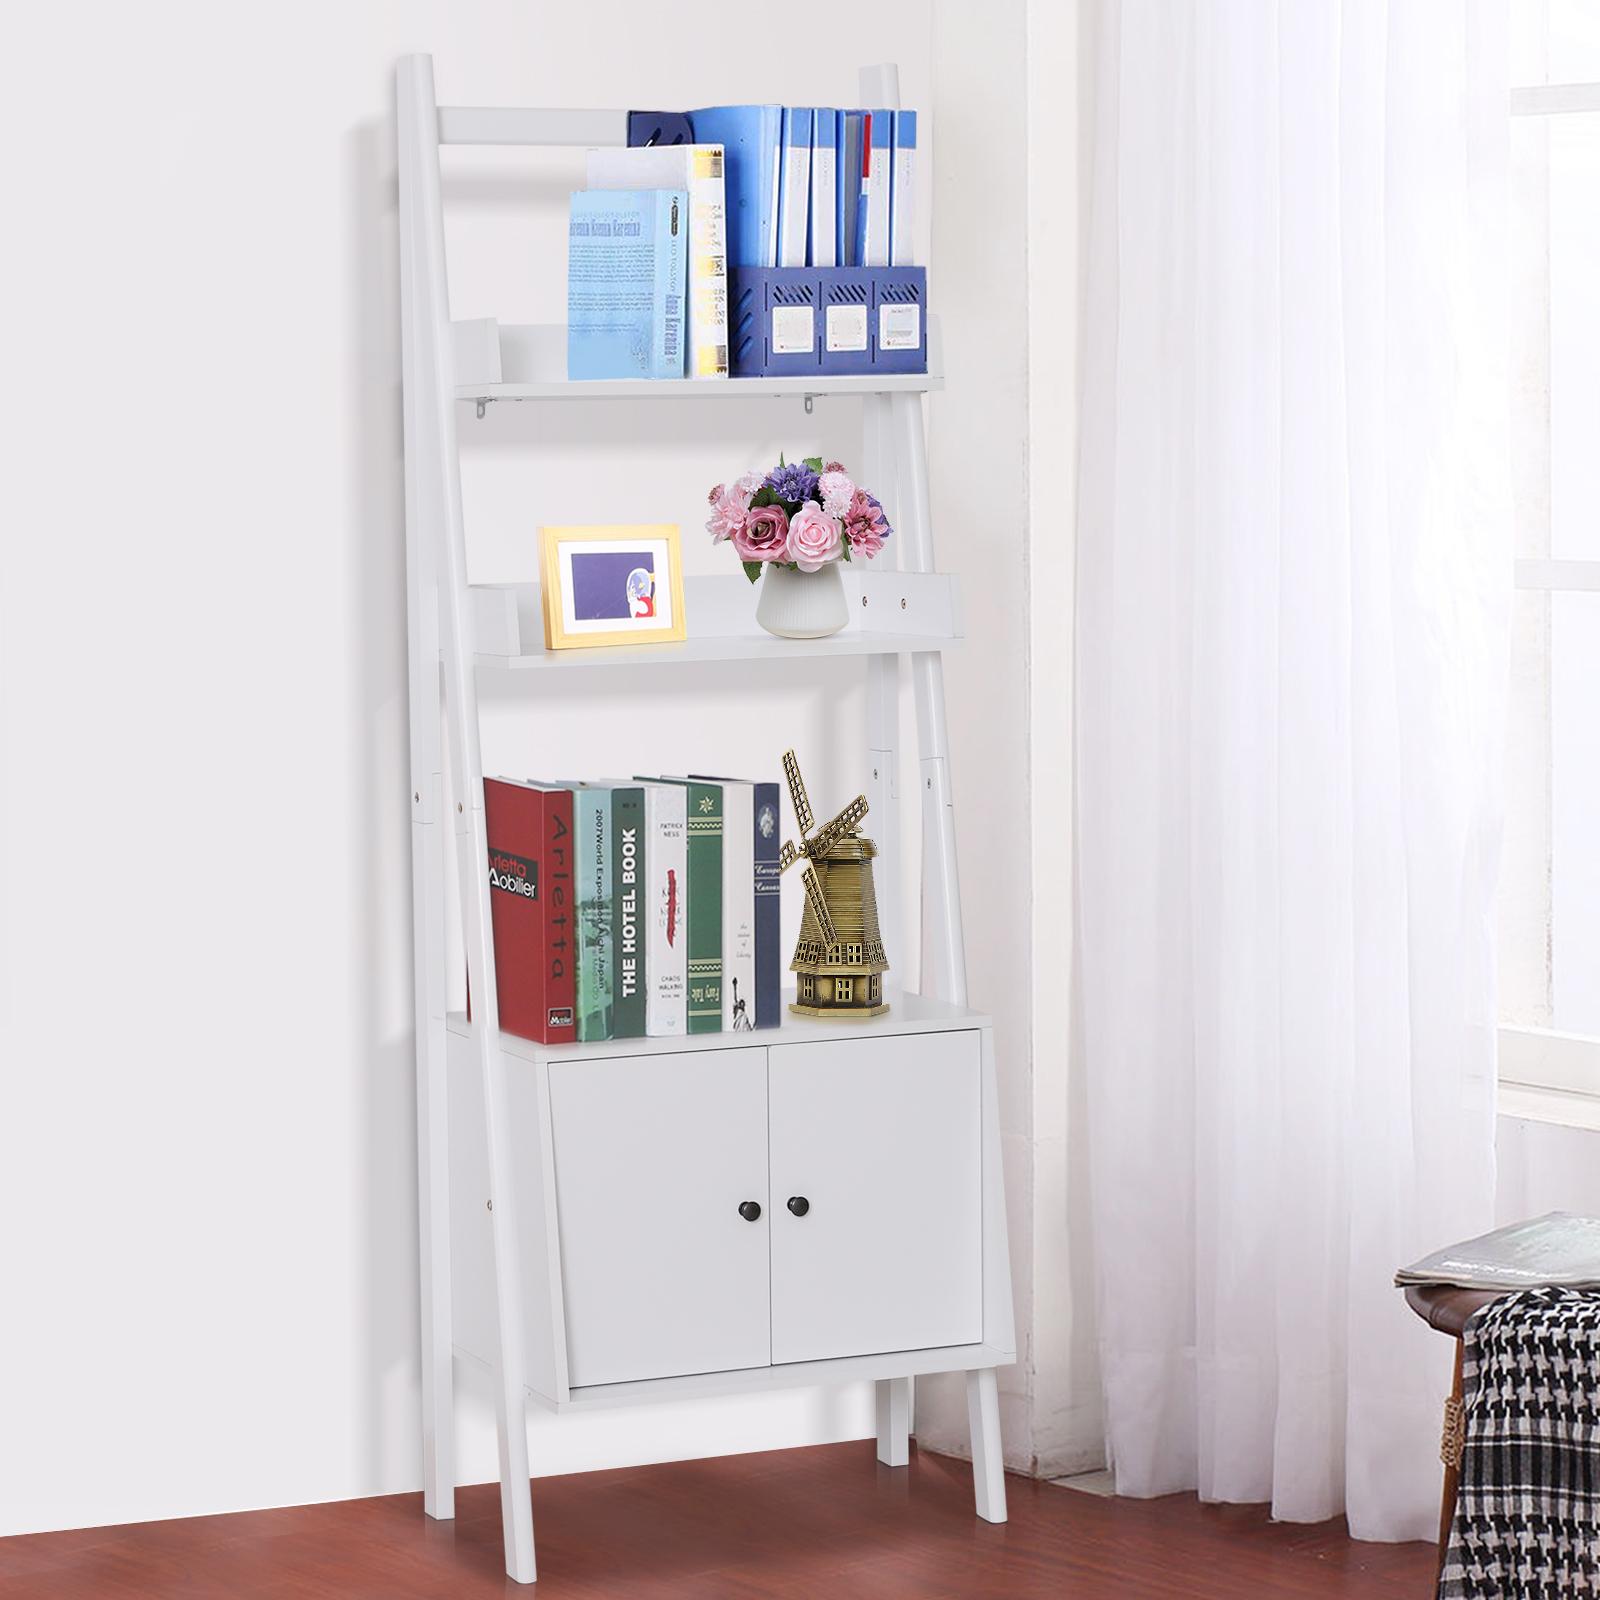 Details About Homcom 3 Tier Freestanding Shelf Unit Ladder Bookcase Display Stand W Cabinet